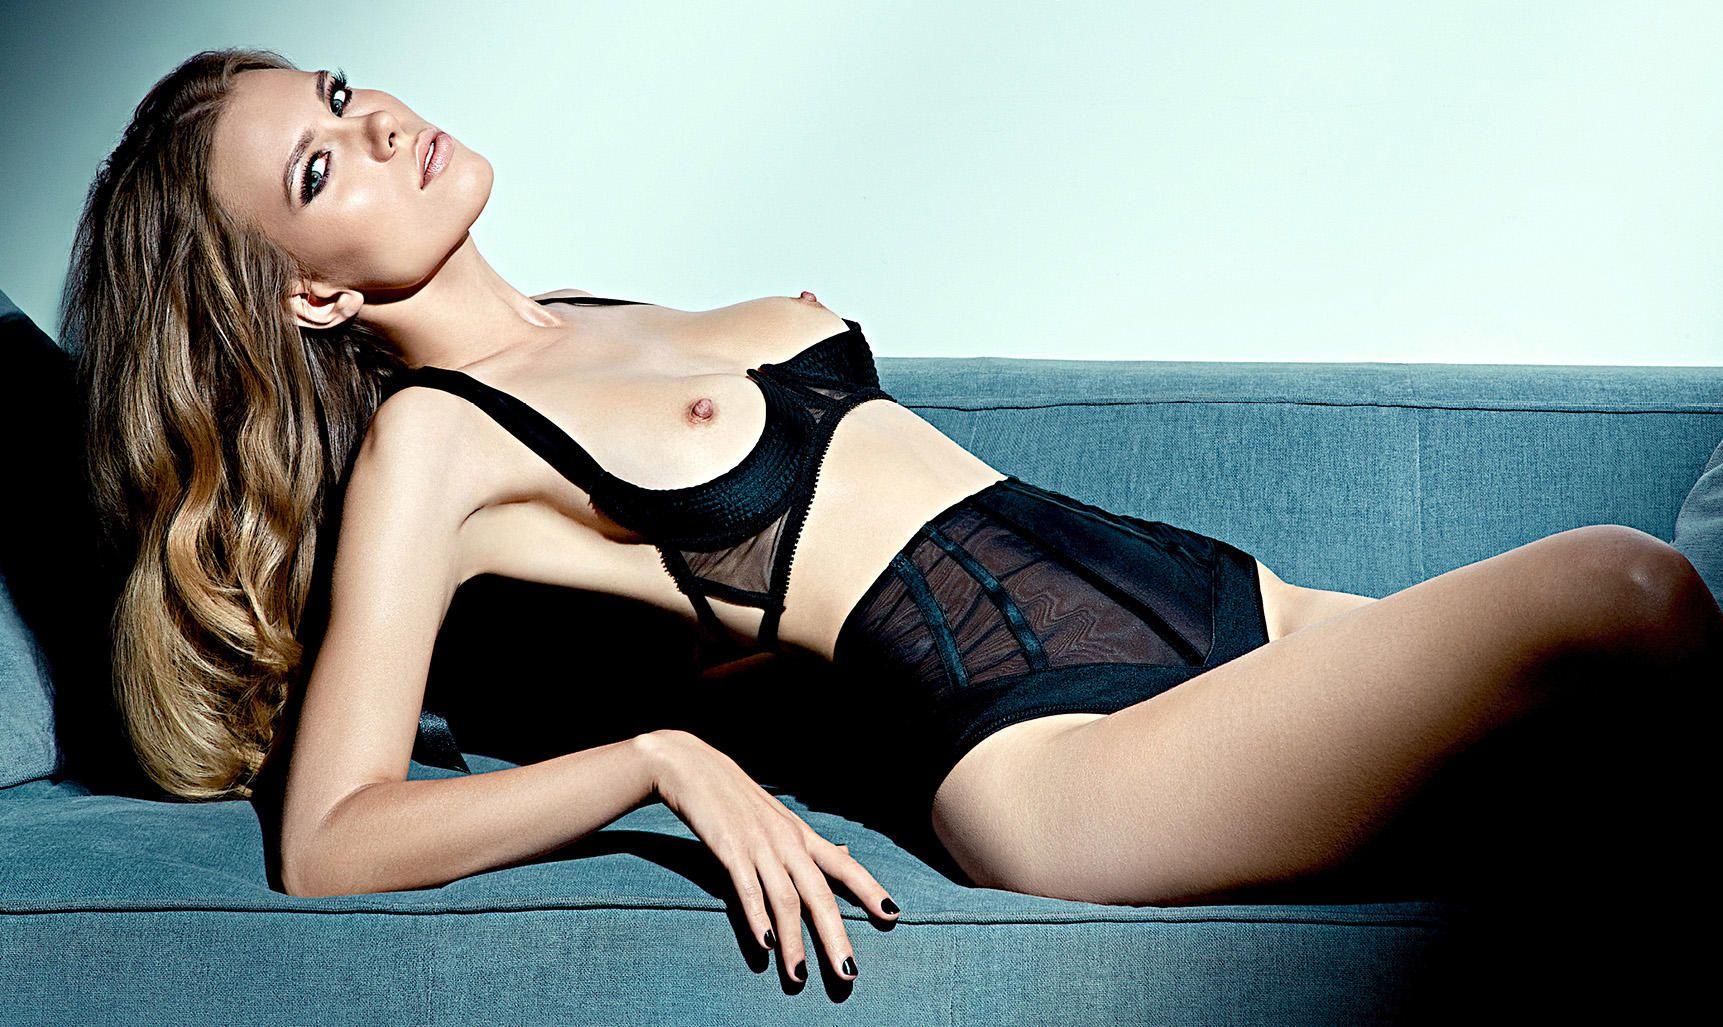 Lena-Wann-Topless-2